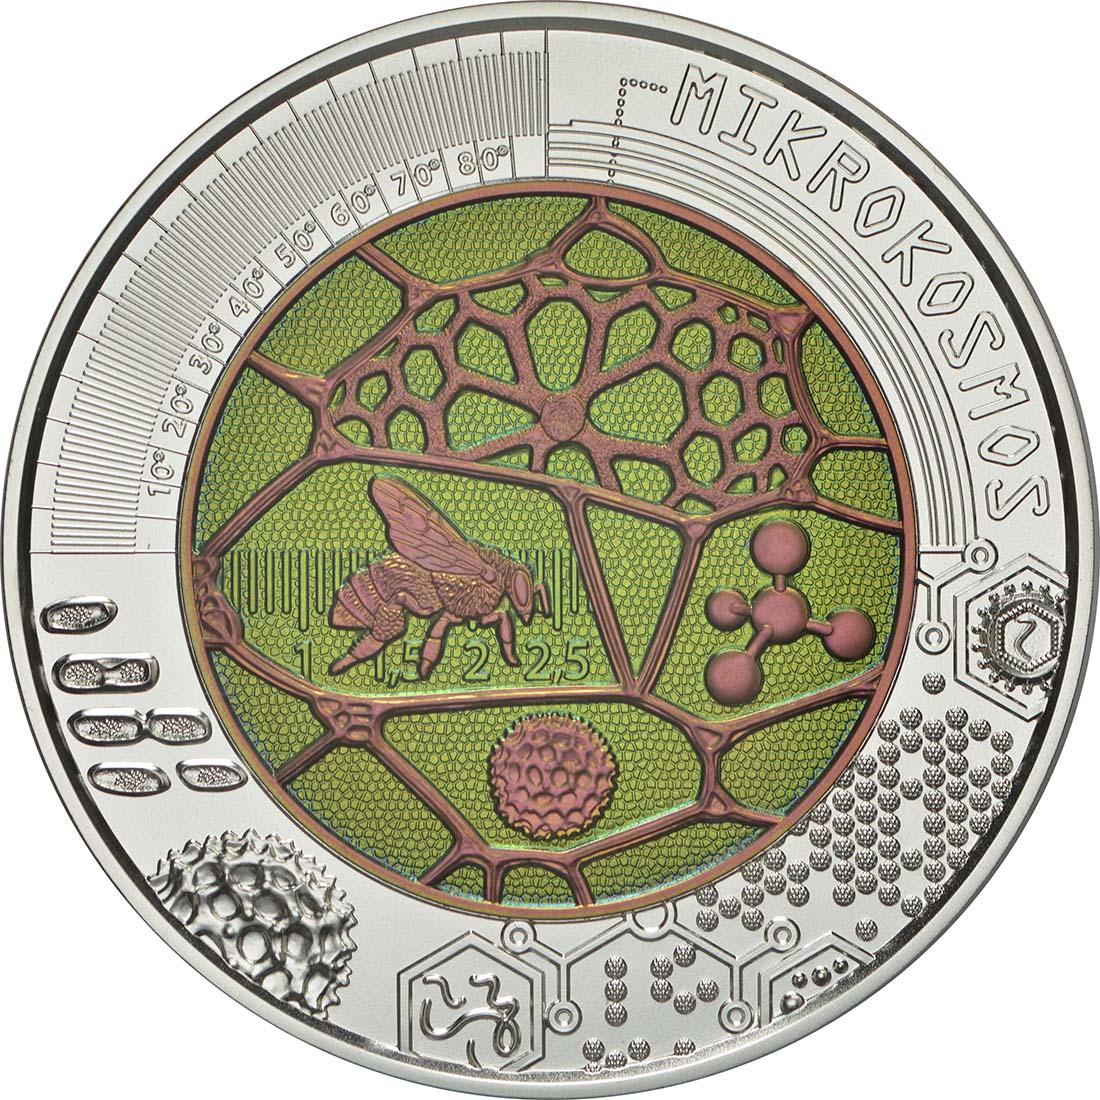 25 Euro Mikrokosmos 2017 Niob Münze aus Österreich